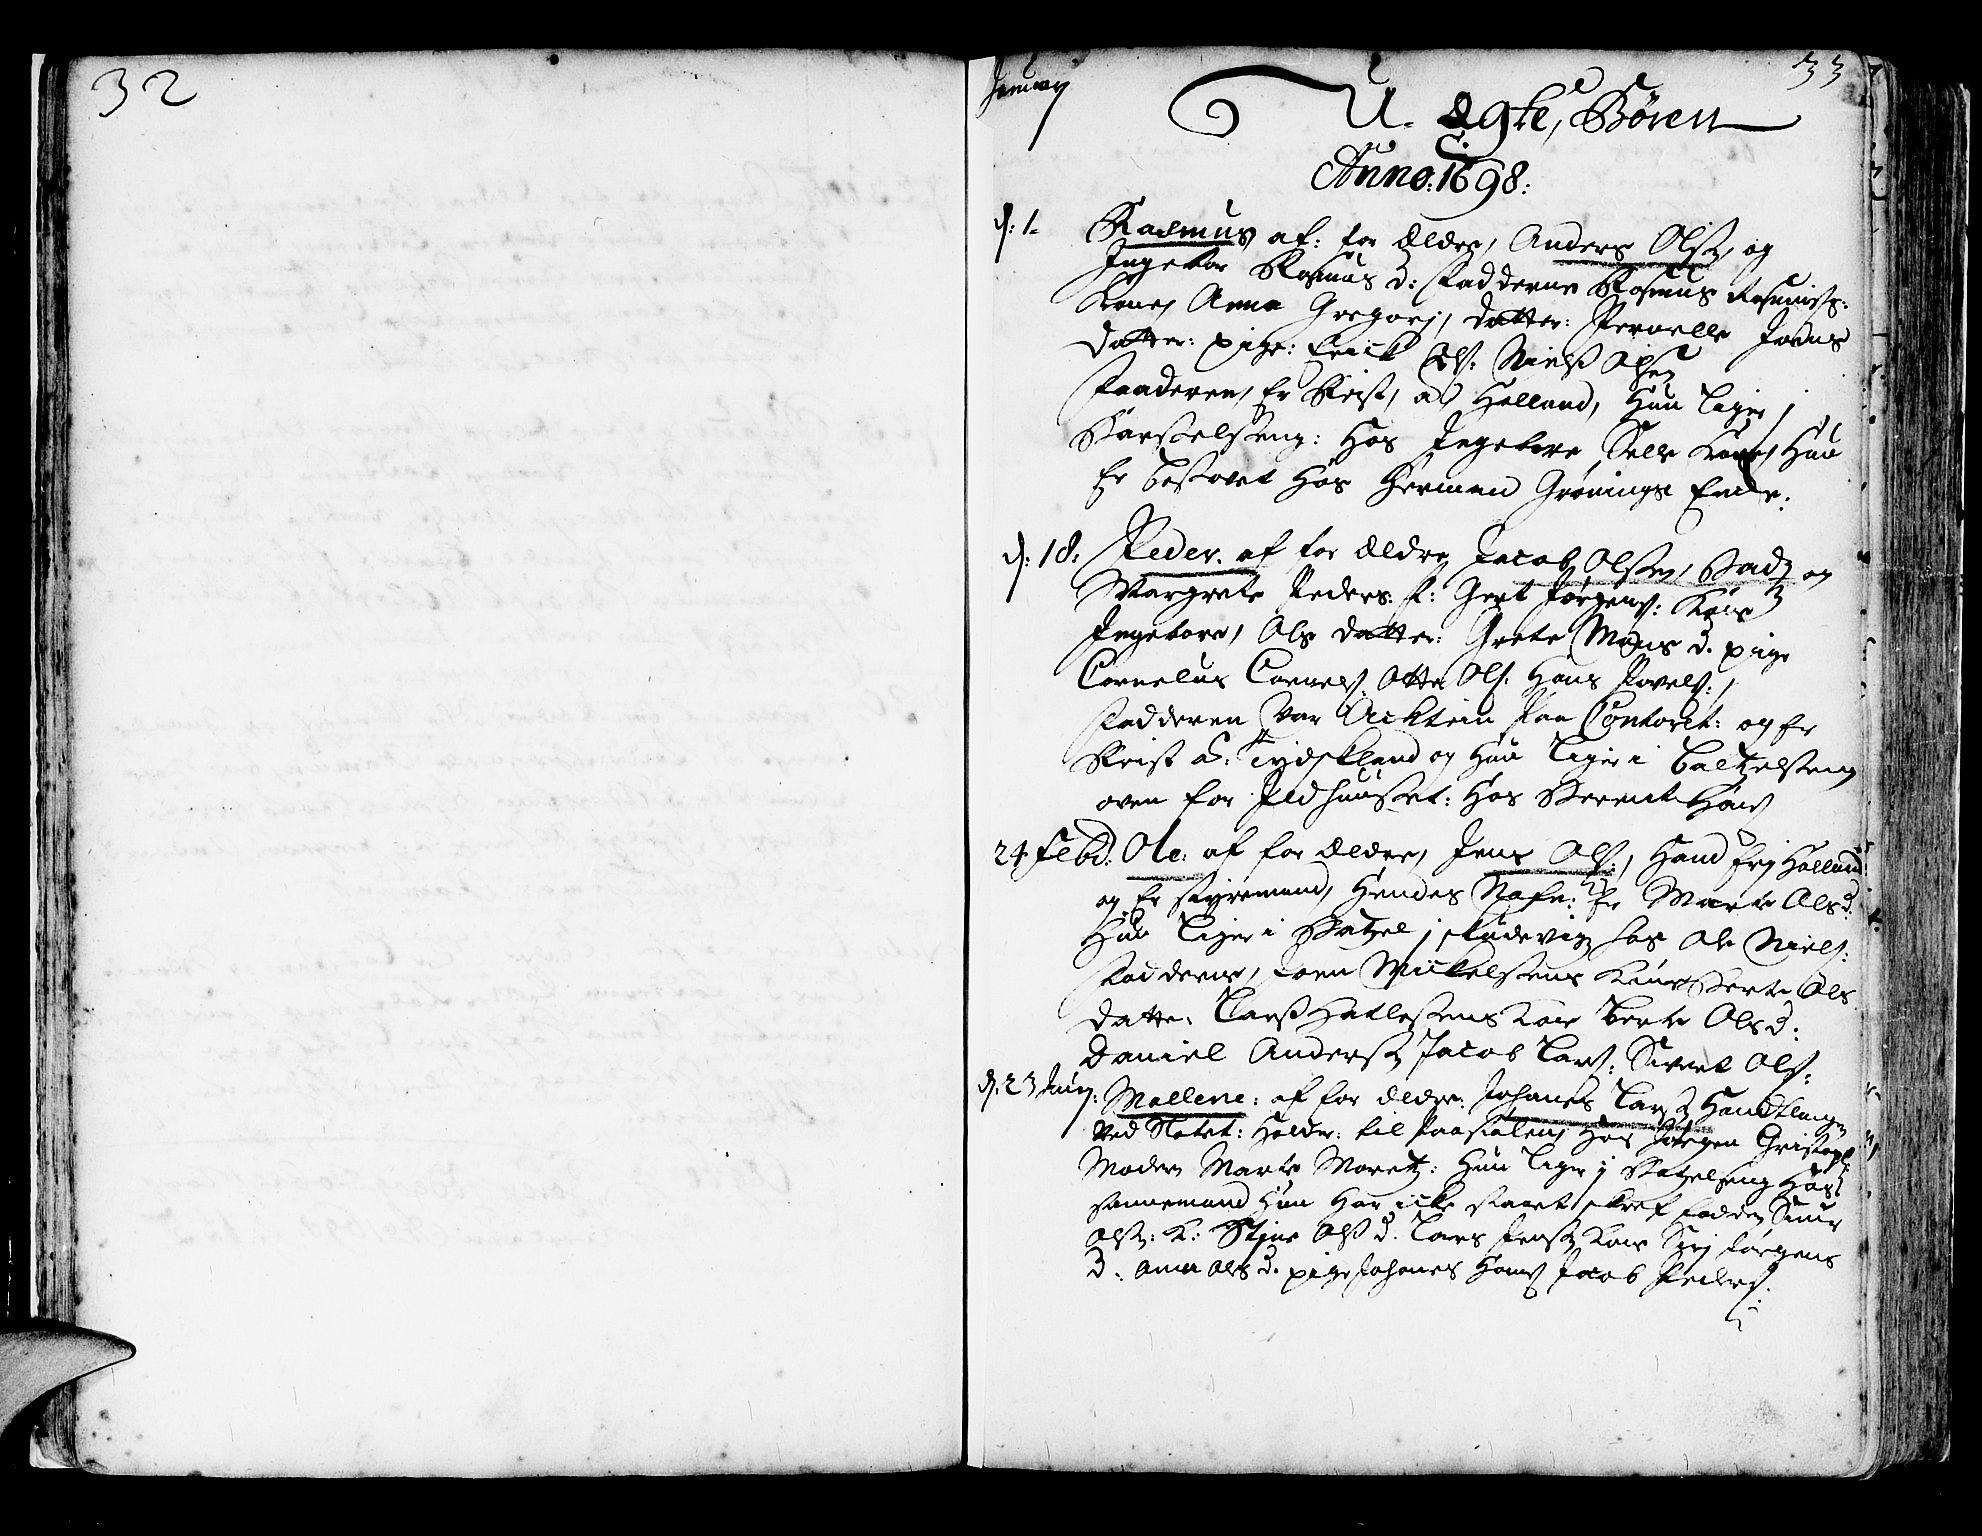 SAB, Korskirken Sokneprestembete, H/Haa/L0003: Ministerialbok nr. A 3, 1698-1719, s. 32-33